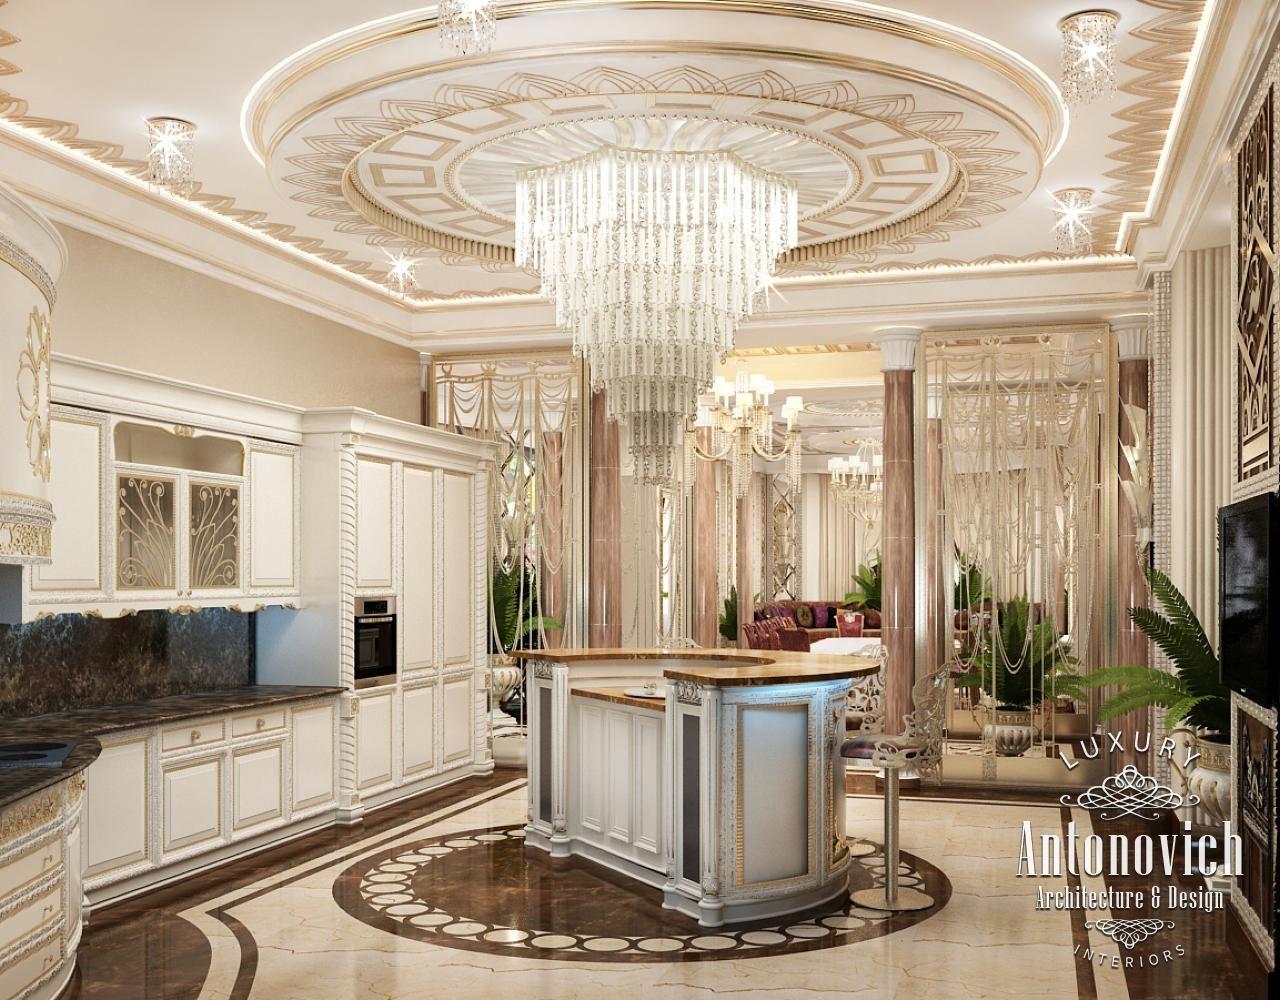 Kitchen Design In Dubai Luxury Kitchen Dining Photo 7 Luxury